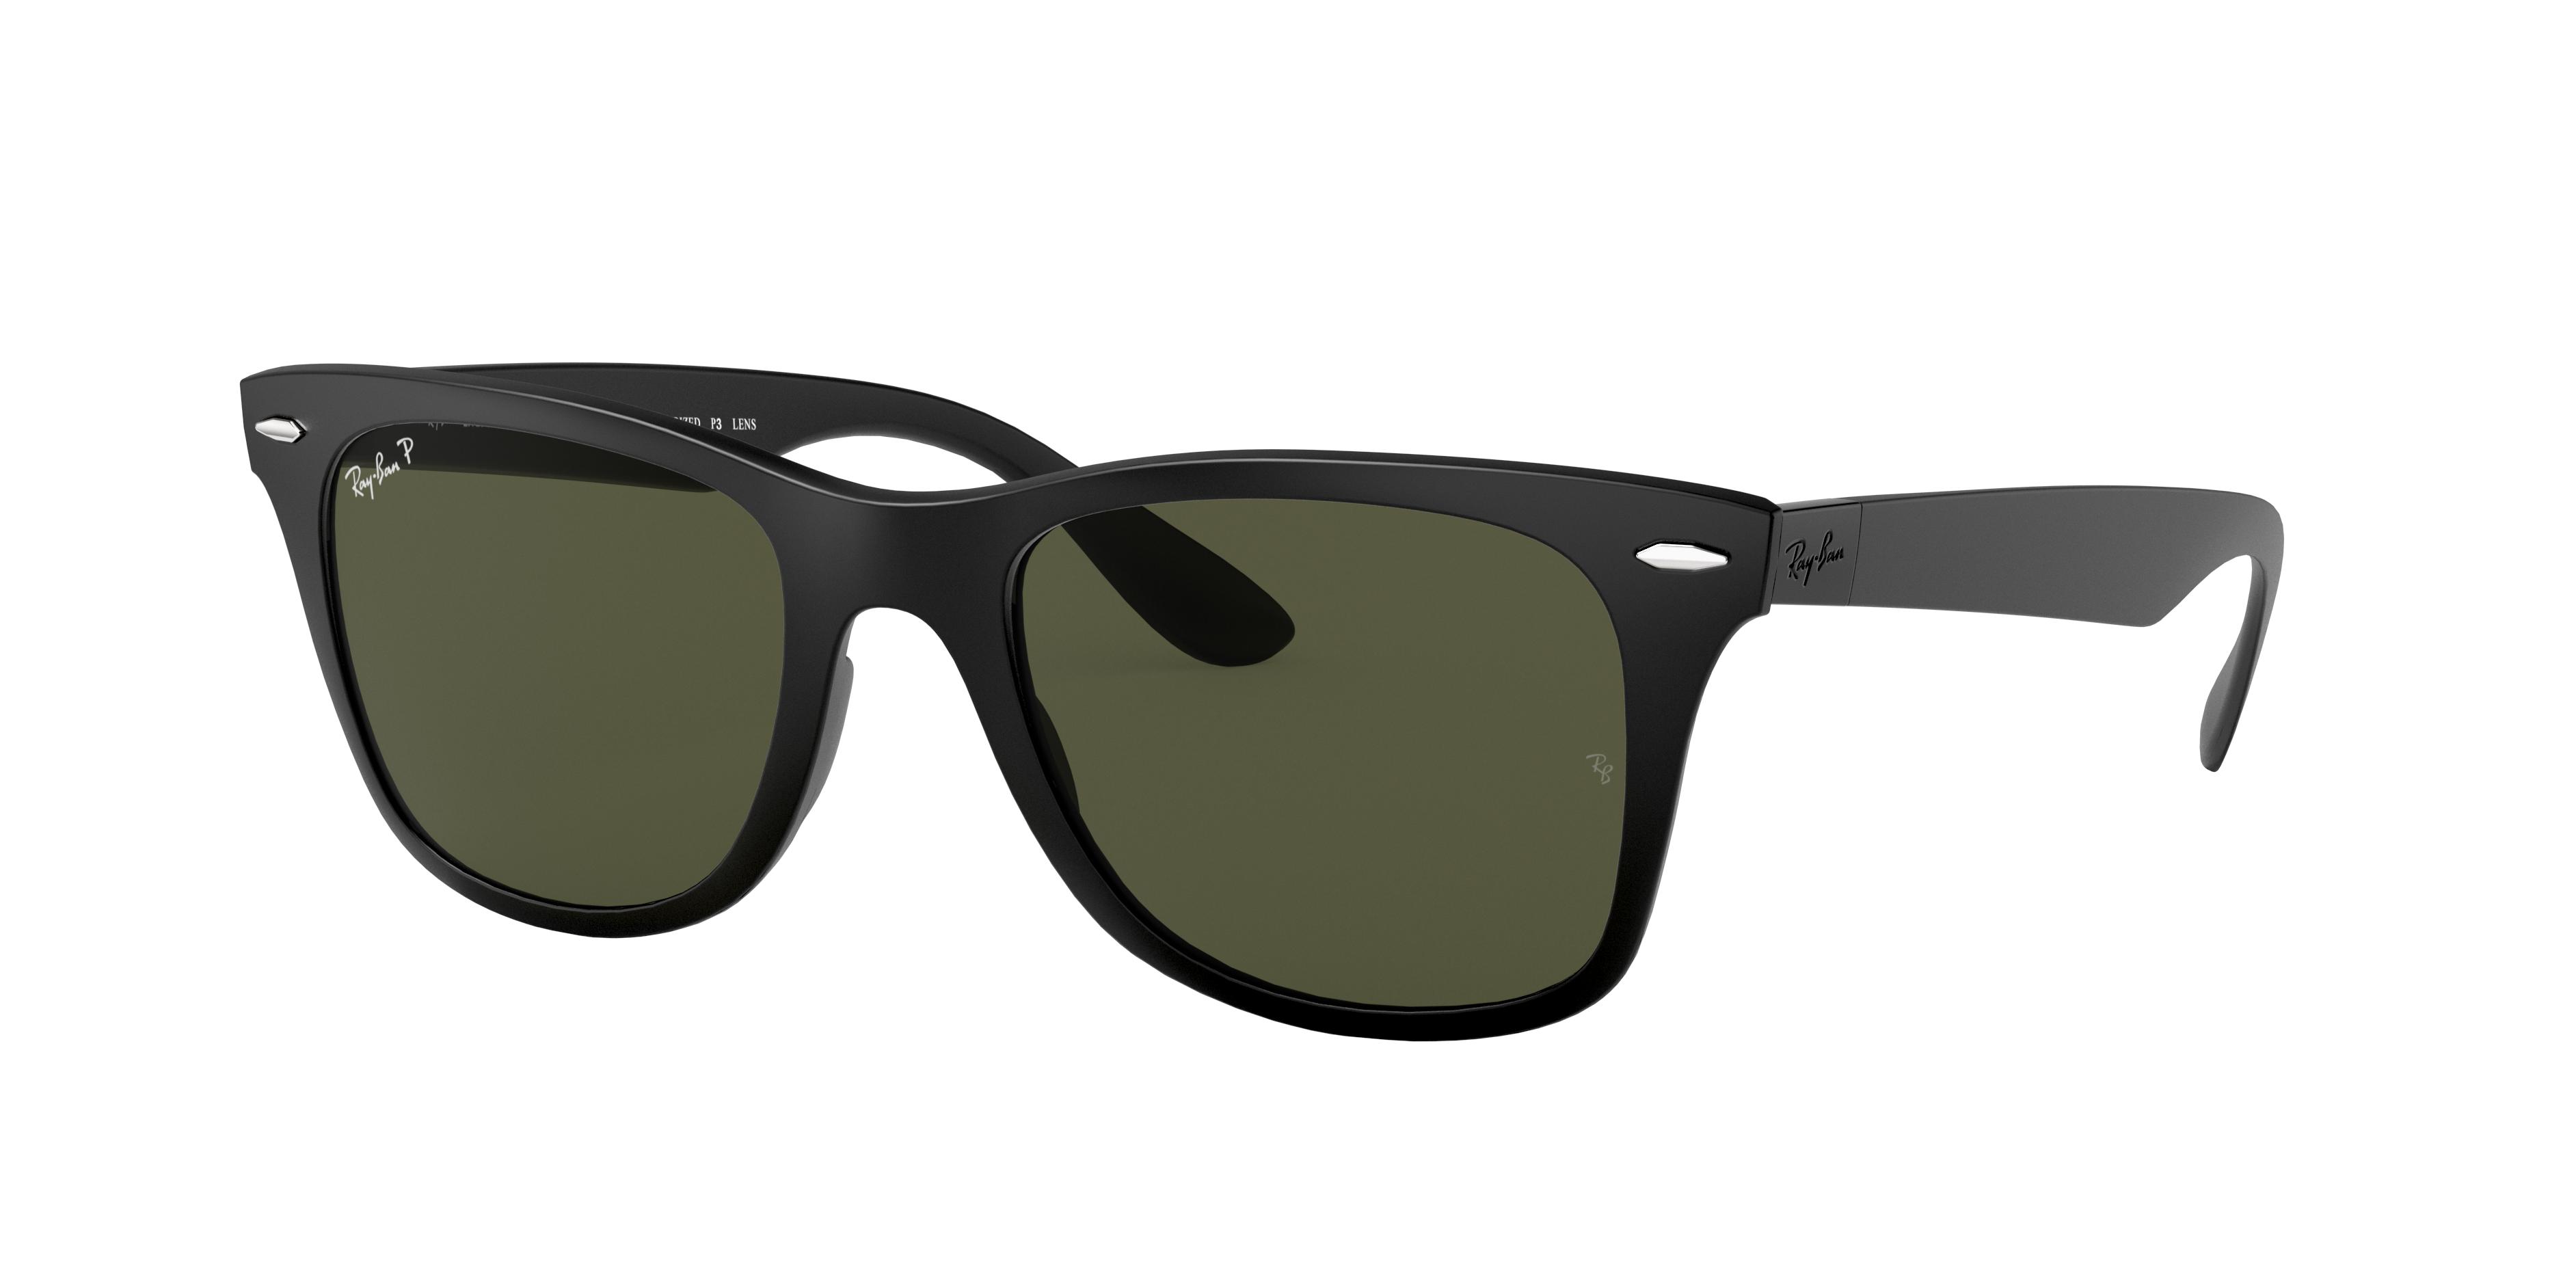 Ray-Ban Wayfarer Liteforce Black, Polarized Green Lenses - RB4195